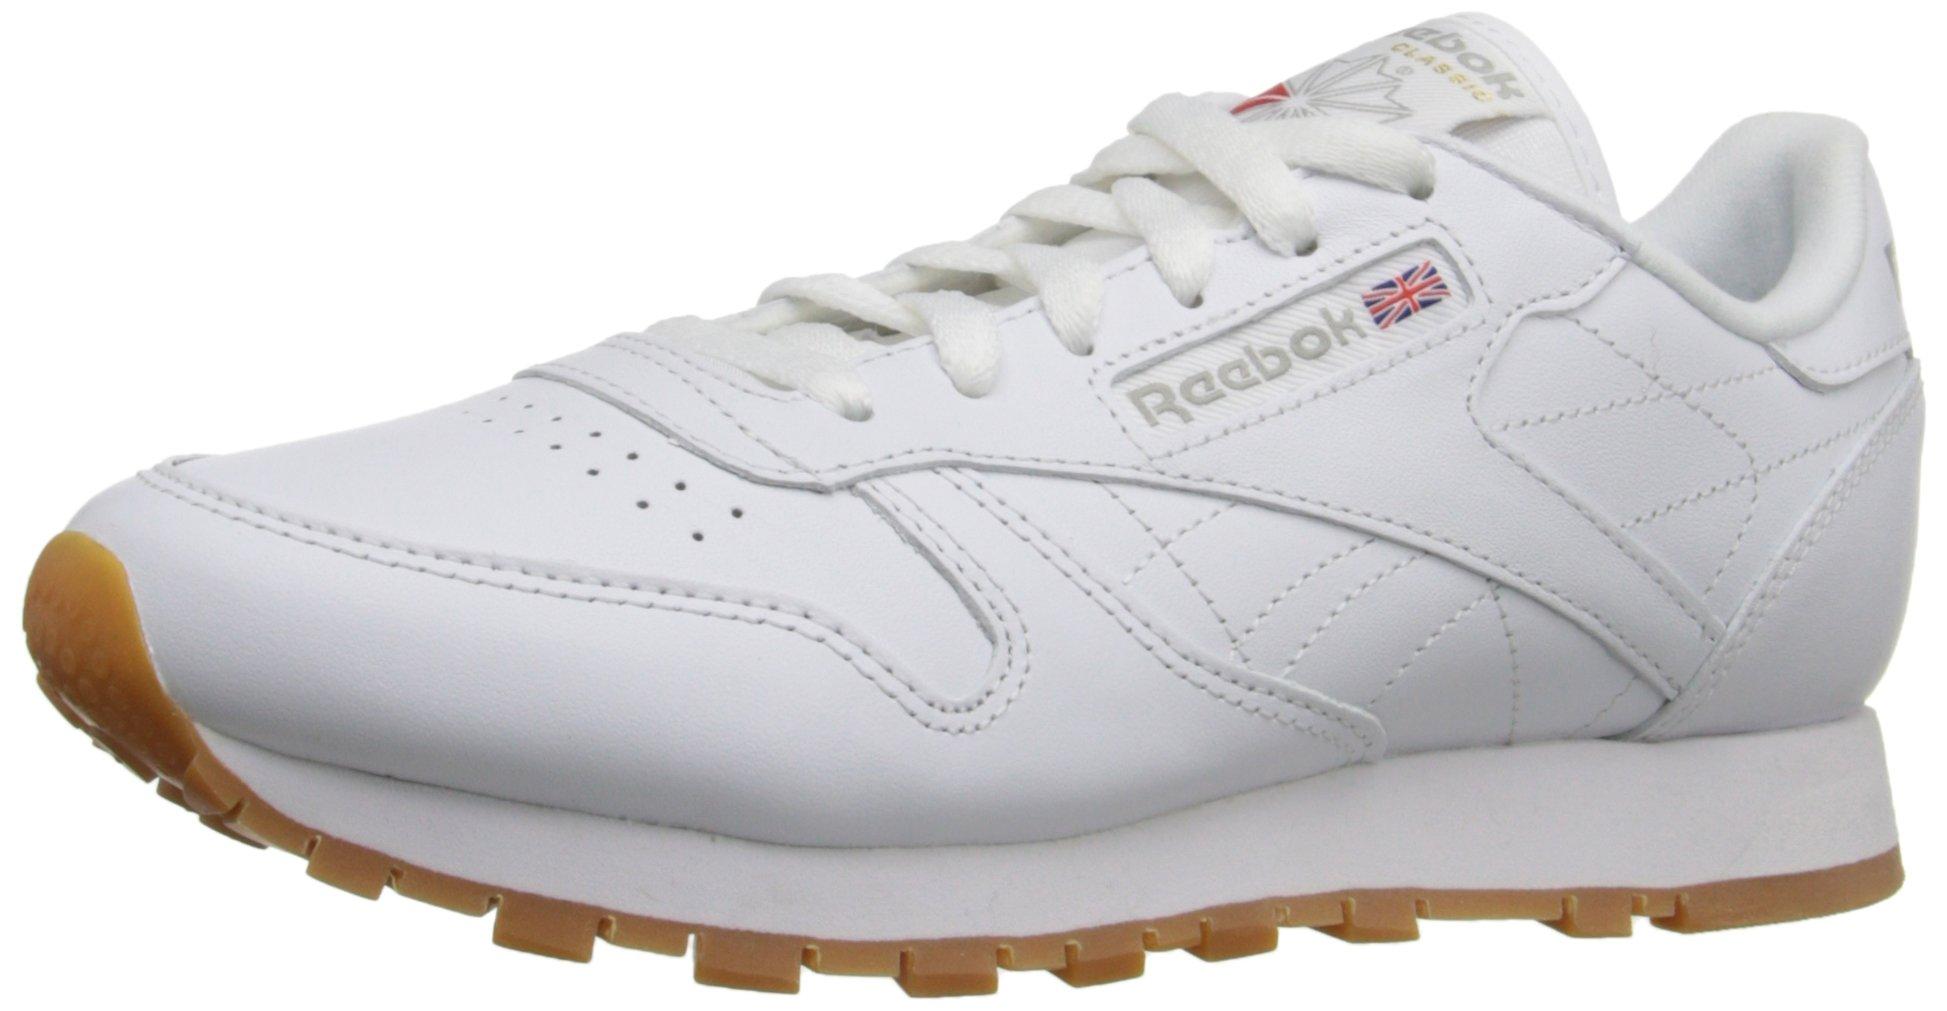 Reebok Women's CL Lthr Sneaker, Us-White/Gum, 6.5 M US